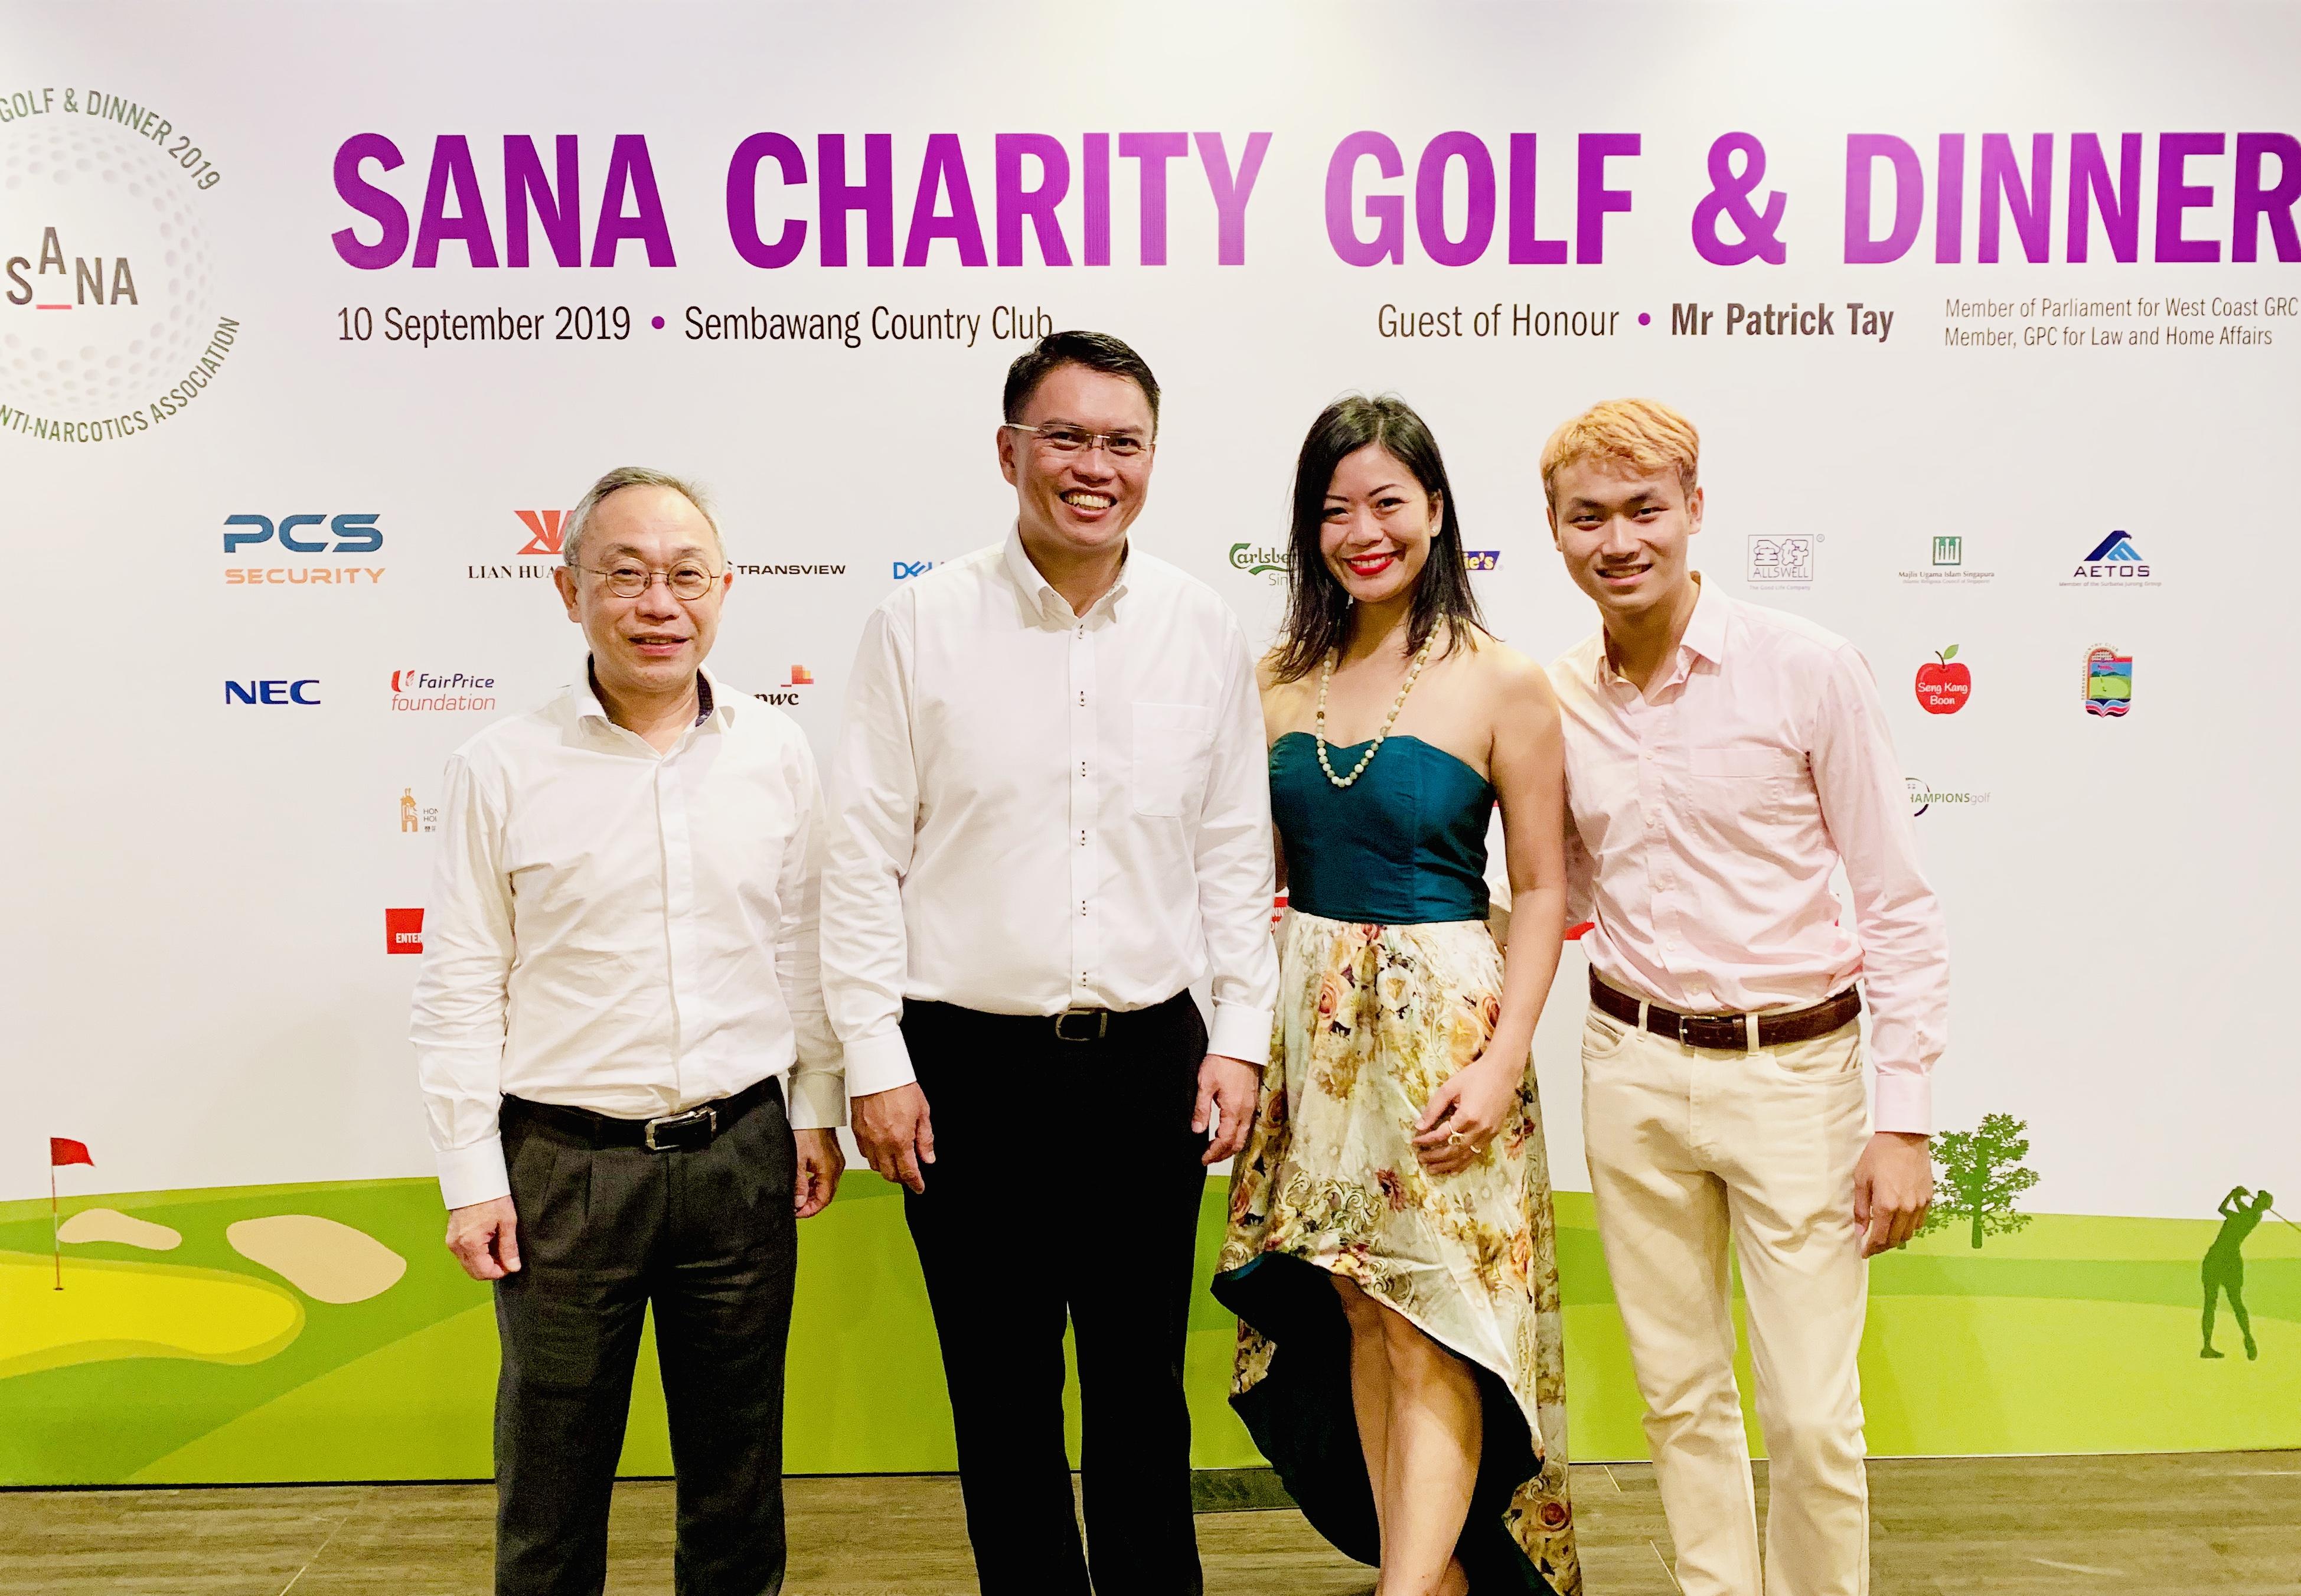 SANA Charity Golf & Dinner